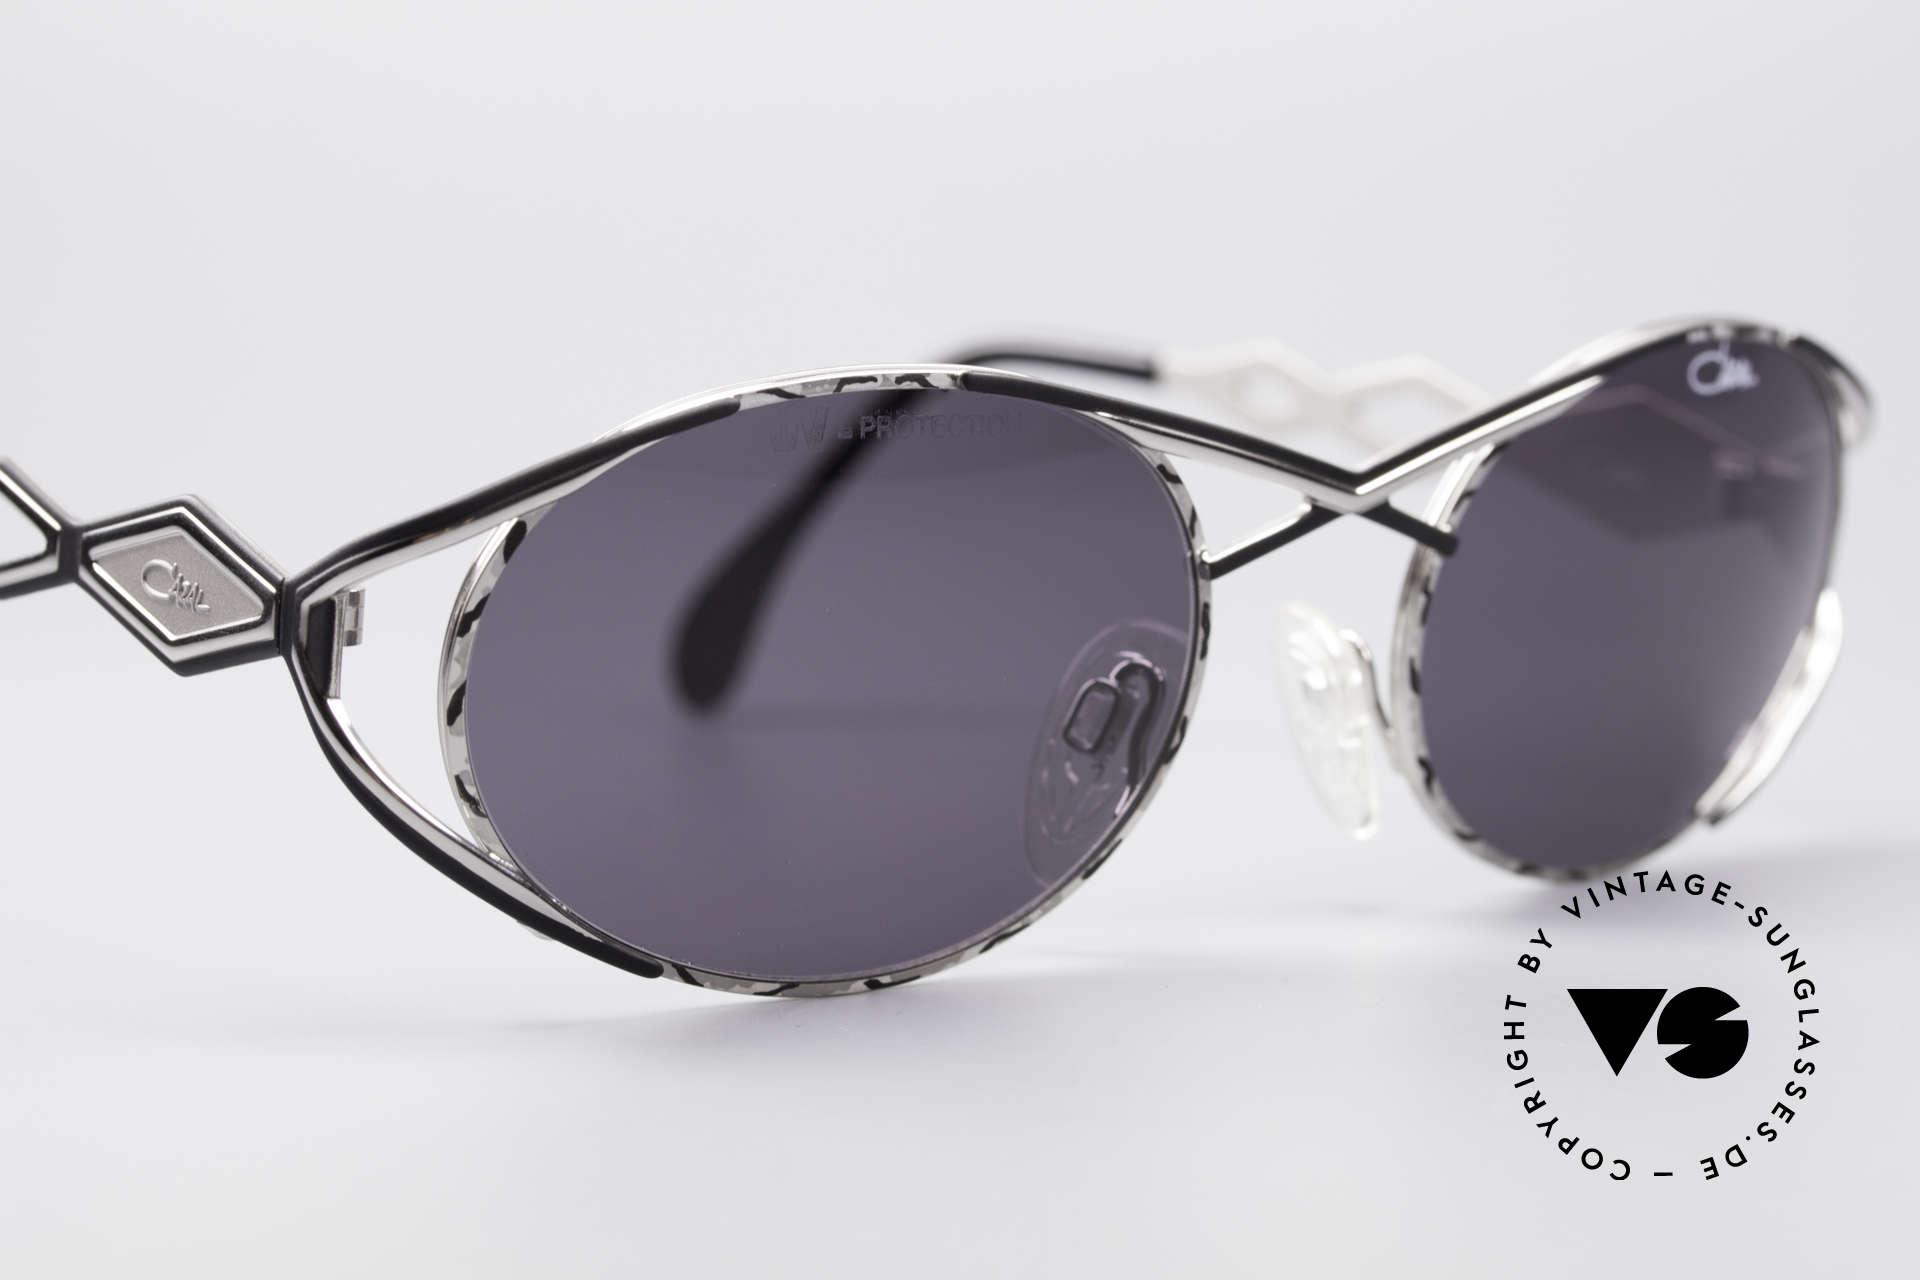 Cazal 977 Vintage 90s Sunglasses Ladies, never worn (like all our vintage sunglasses by Cazal), Made for Women